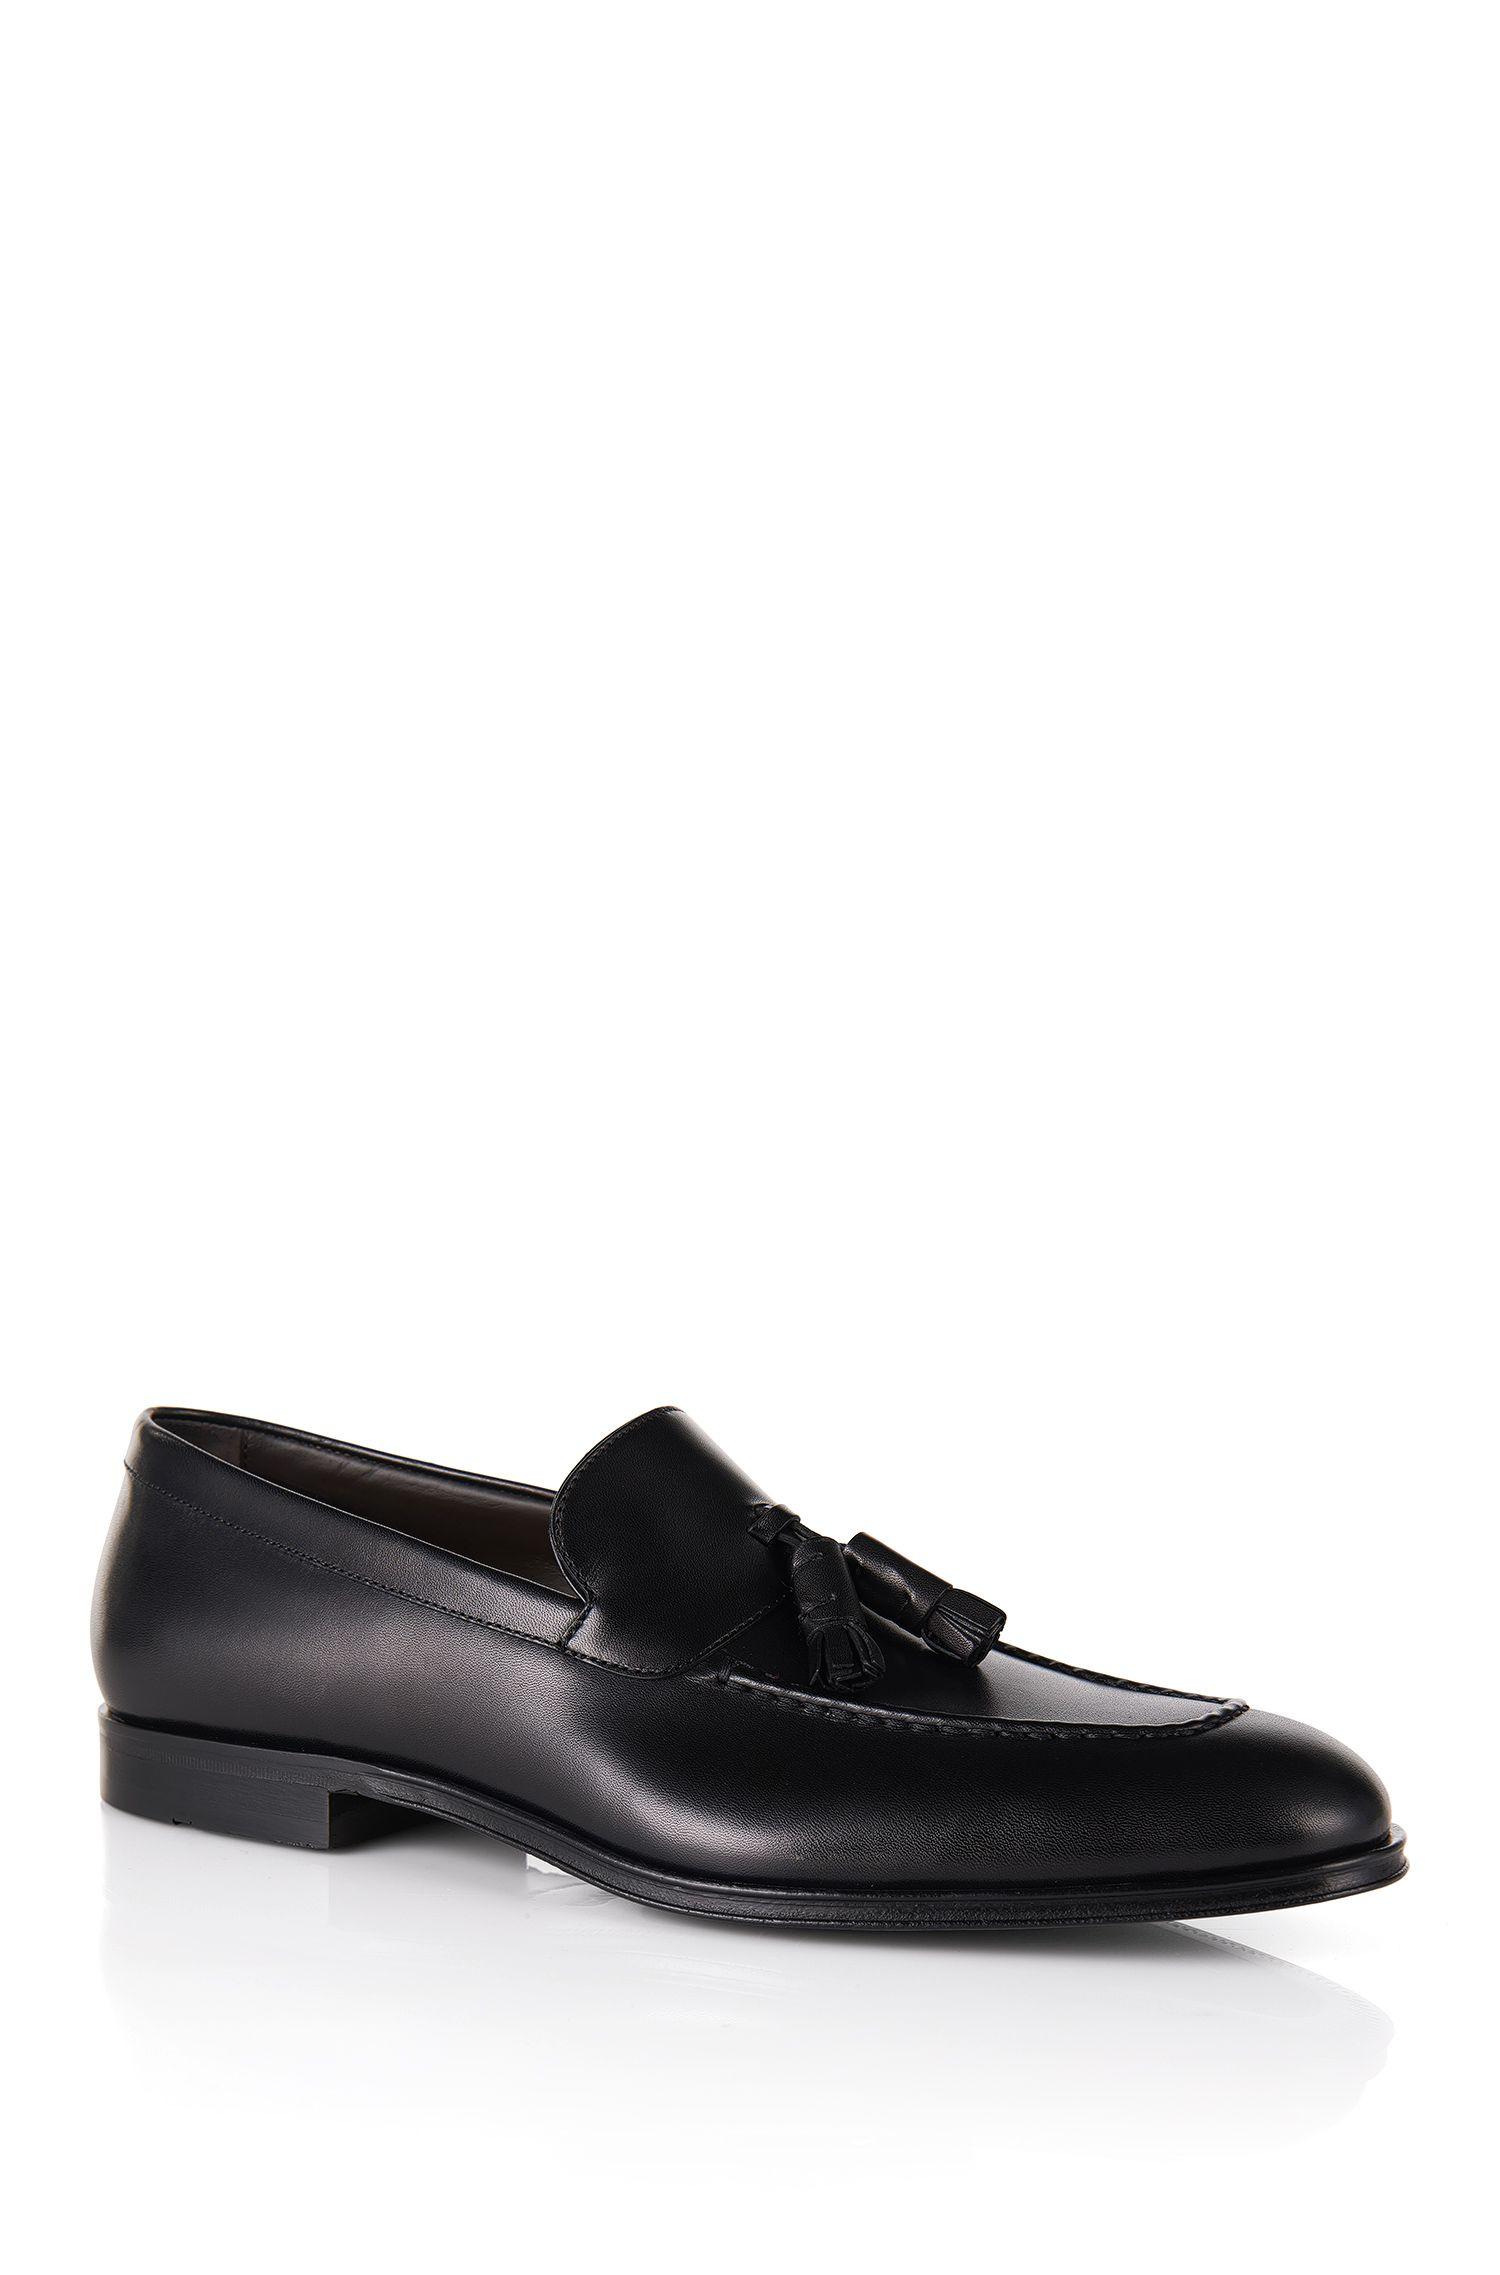 'Scultos'   Italian Calfskin Tassel Loafers